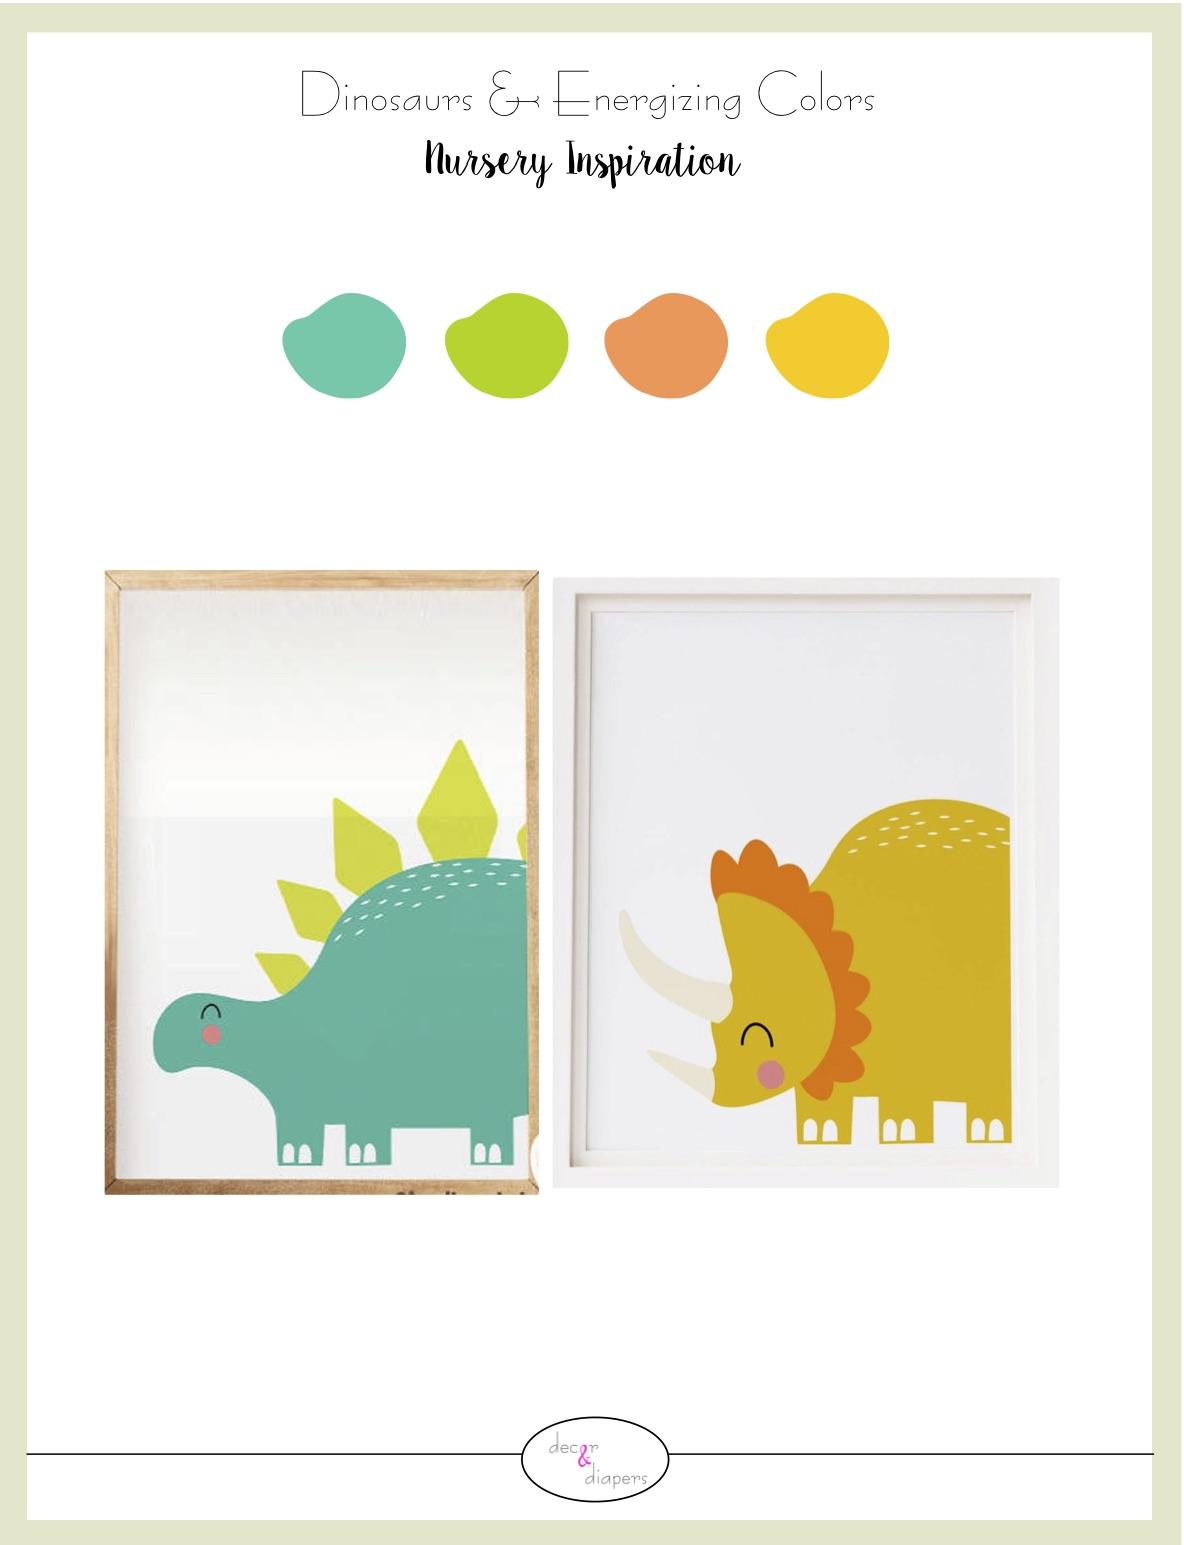 Dinosaurs & Energizing Colors- Nursery